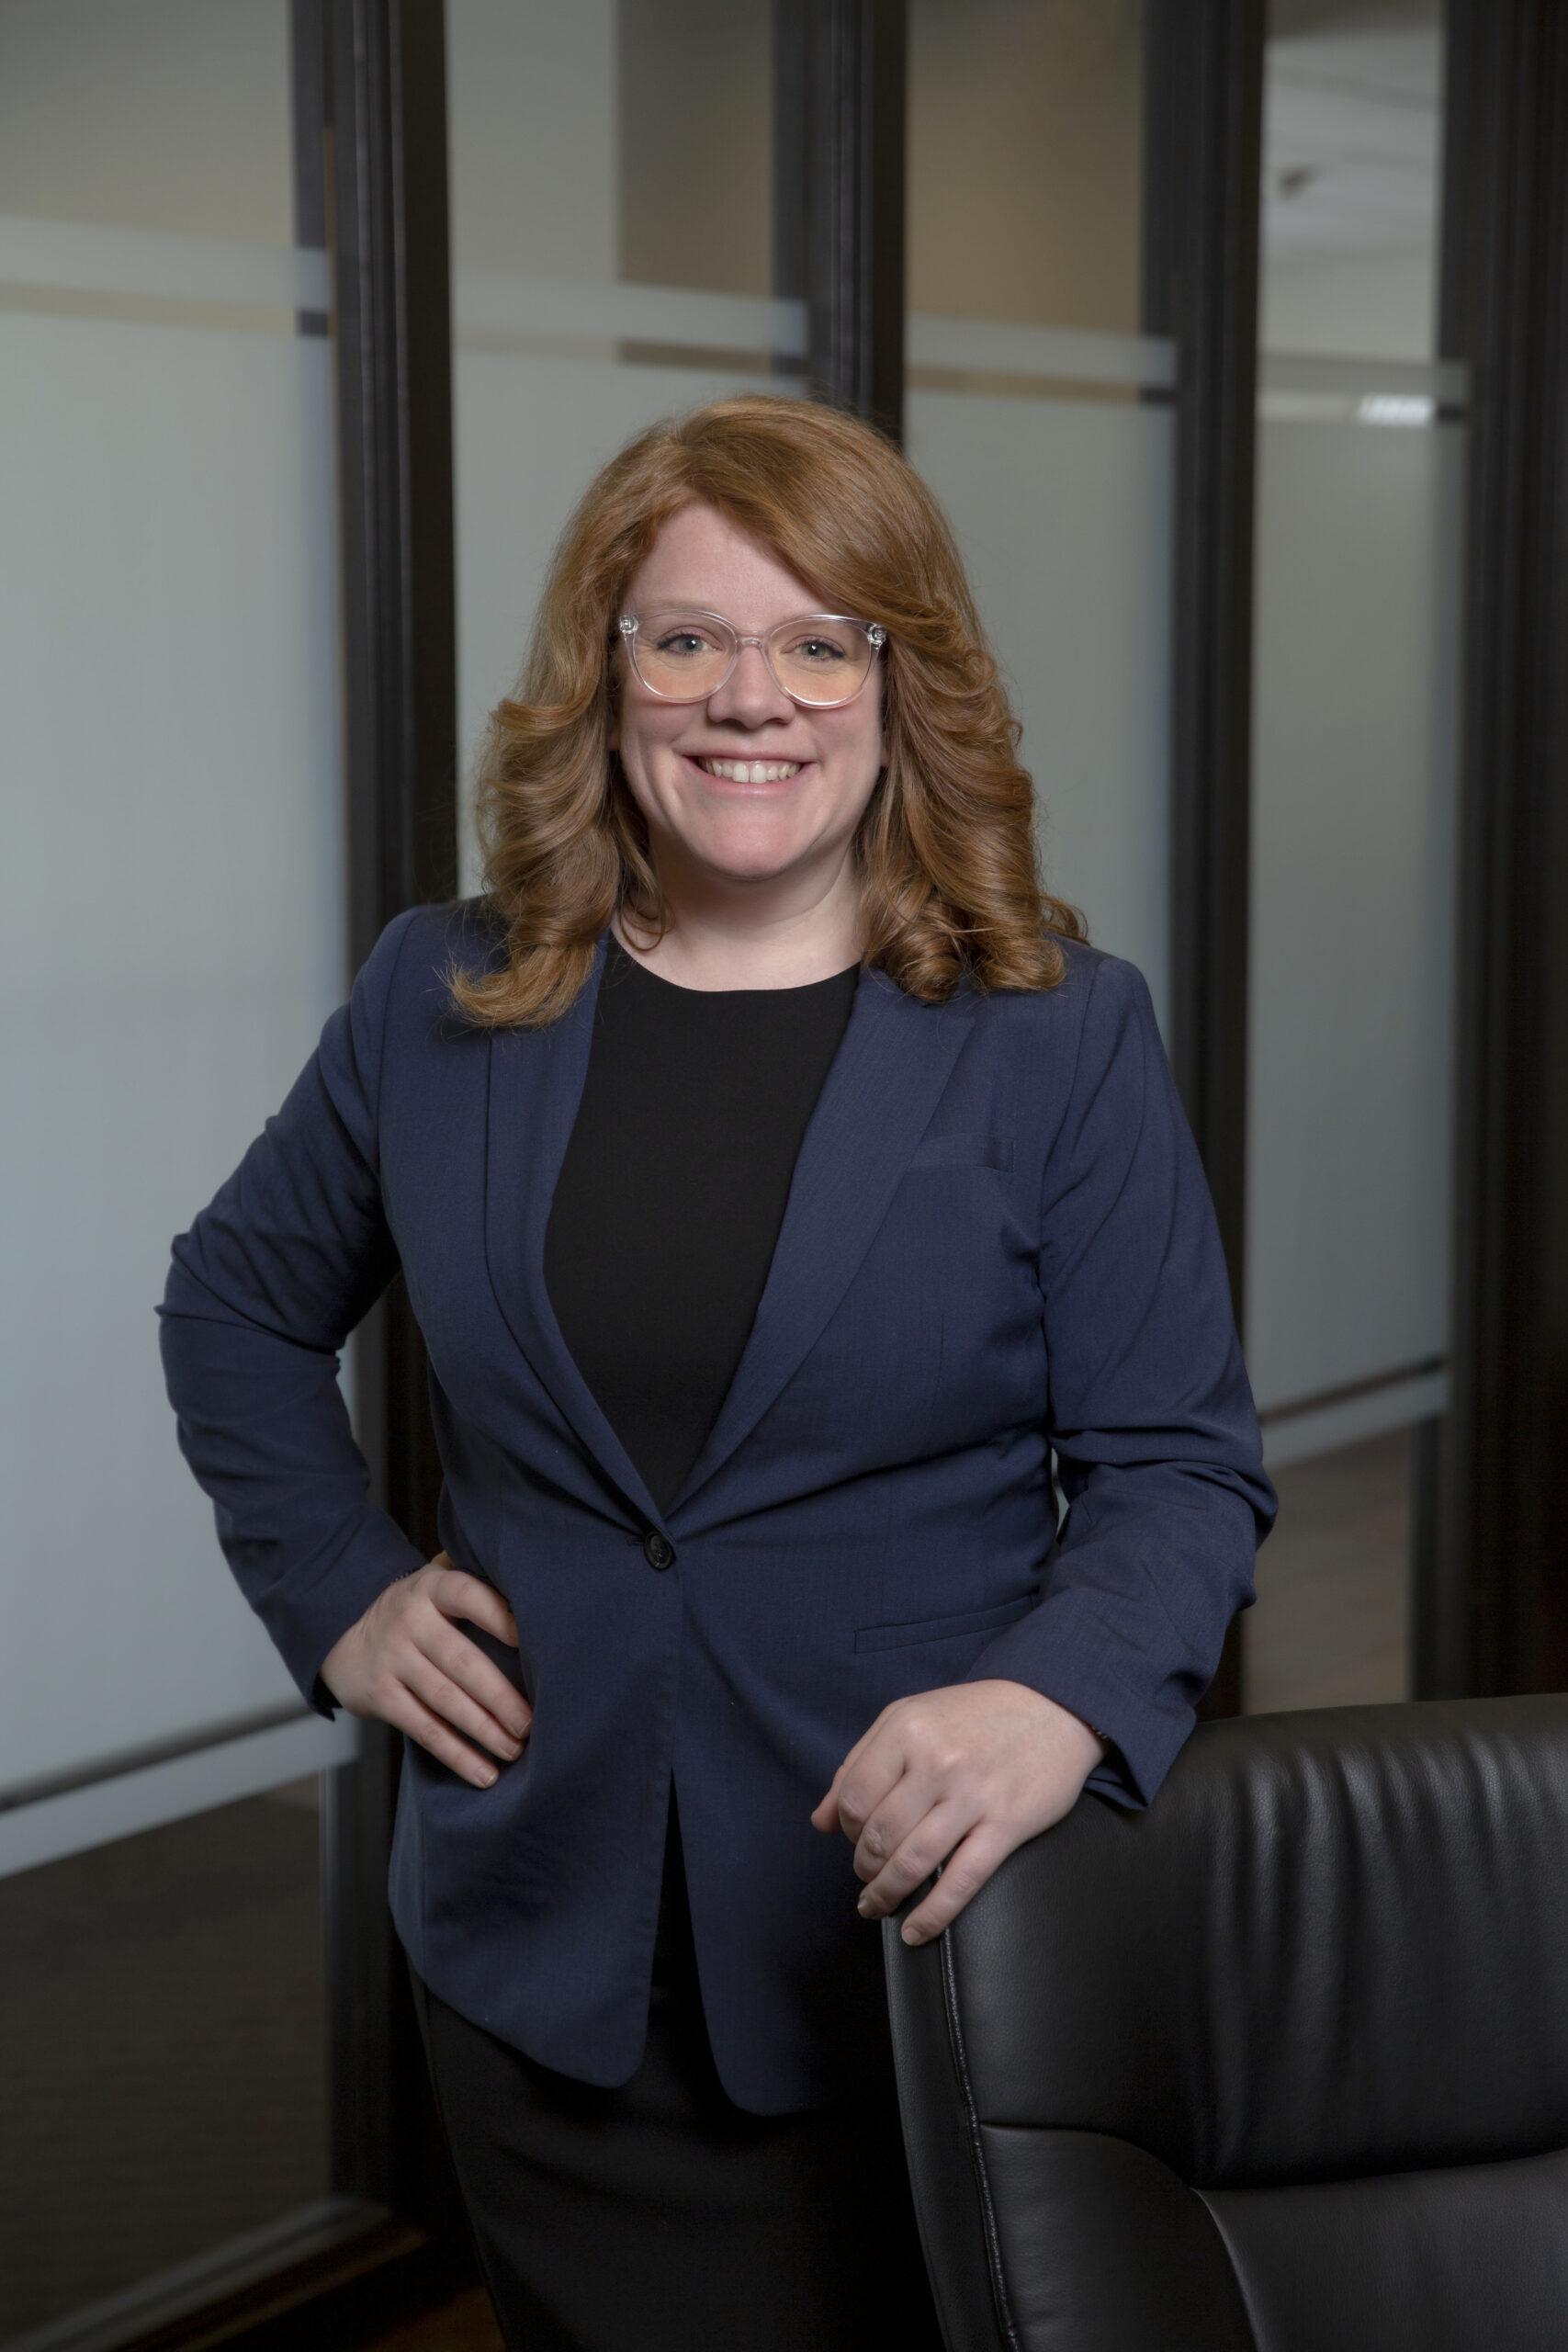 Attorney at Law, Drew Devenport